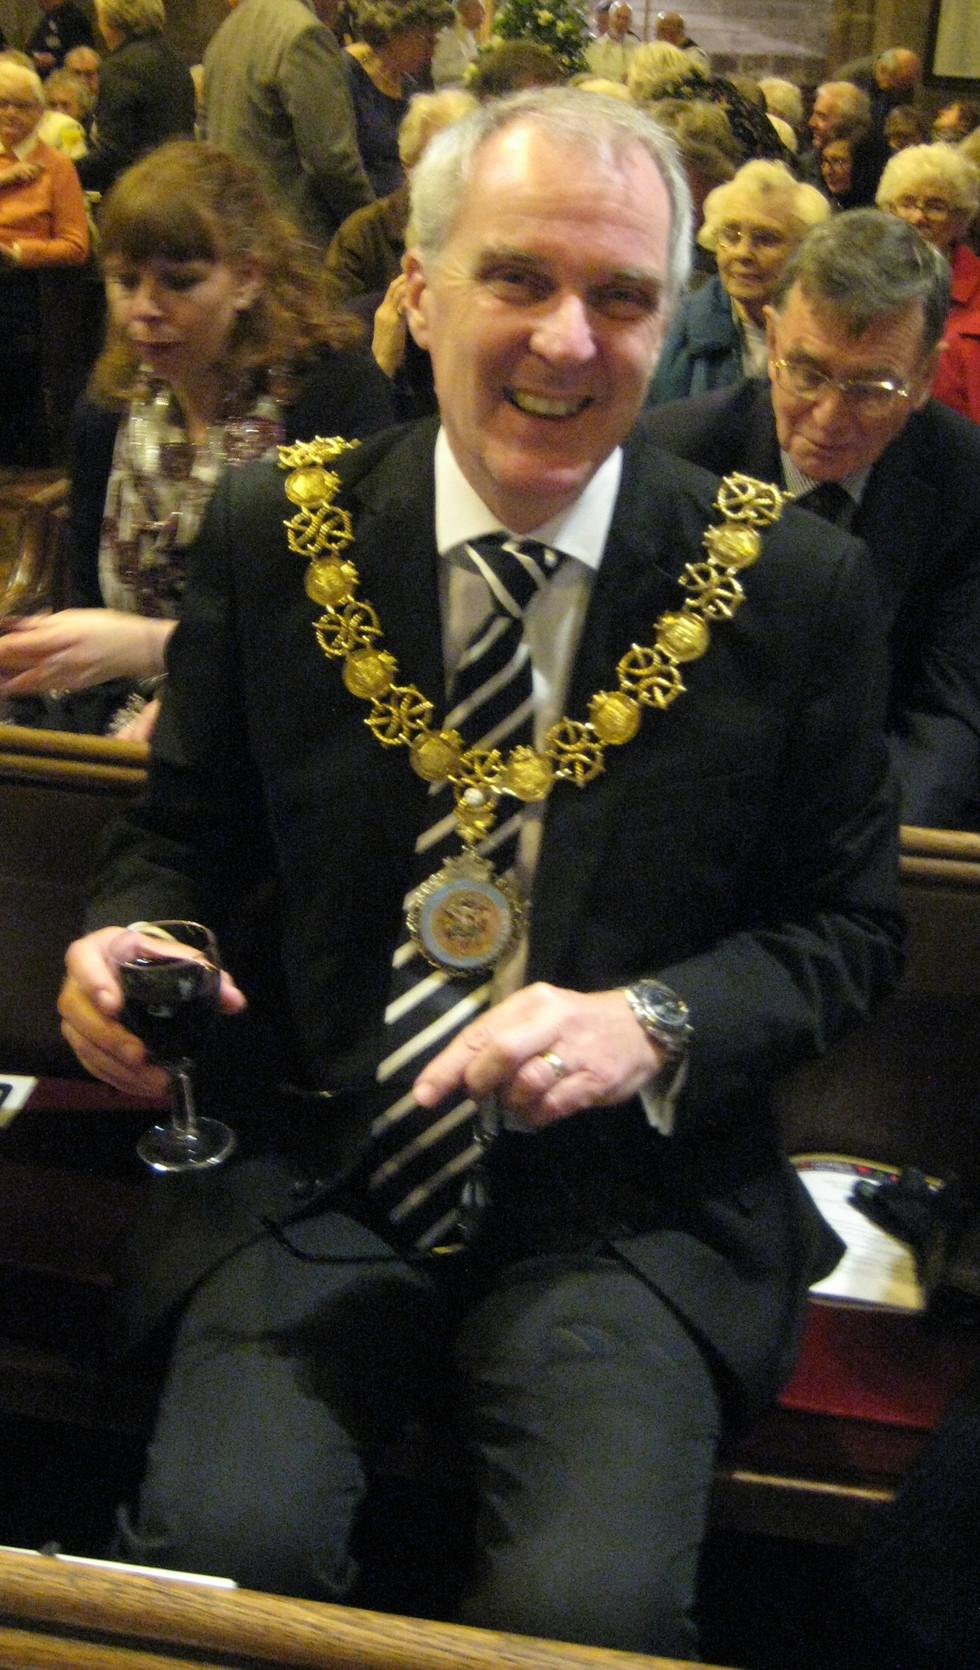 Mayor Aiden Godfrey March 2018.JPG